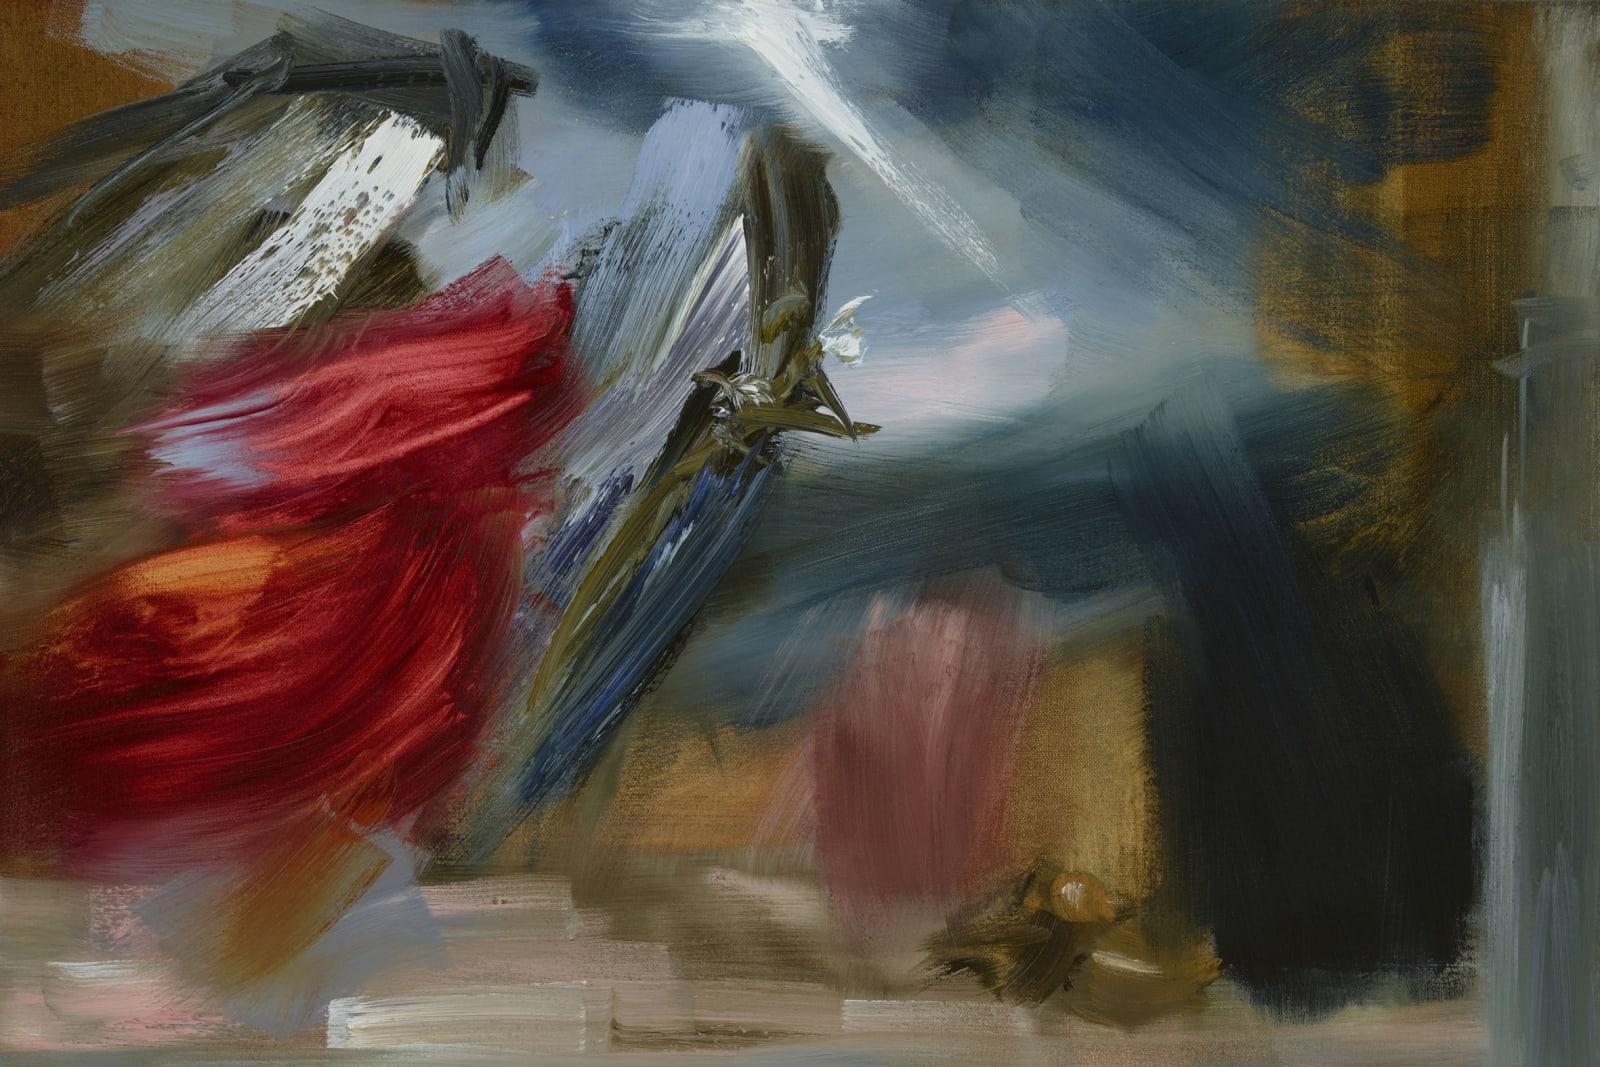 Medium Study I for Yes oil on canvas 51cm x 76cm (20